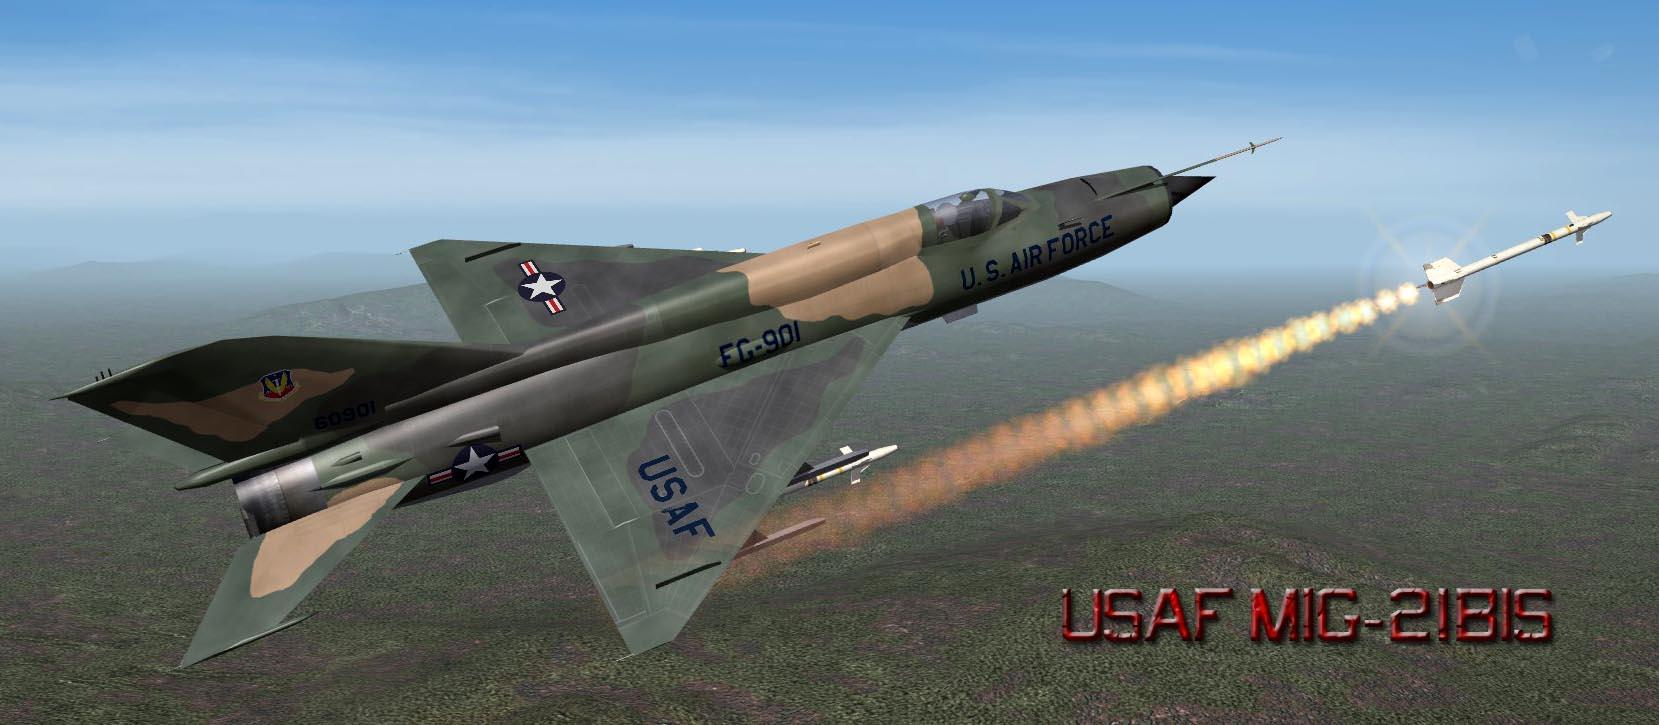 USAF MiG 21 SEA